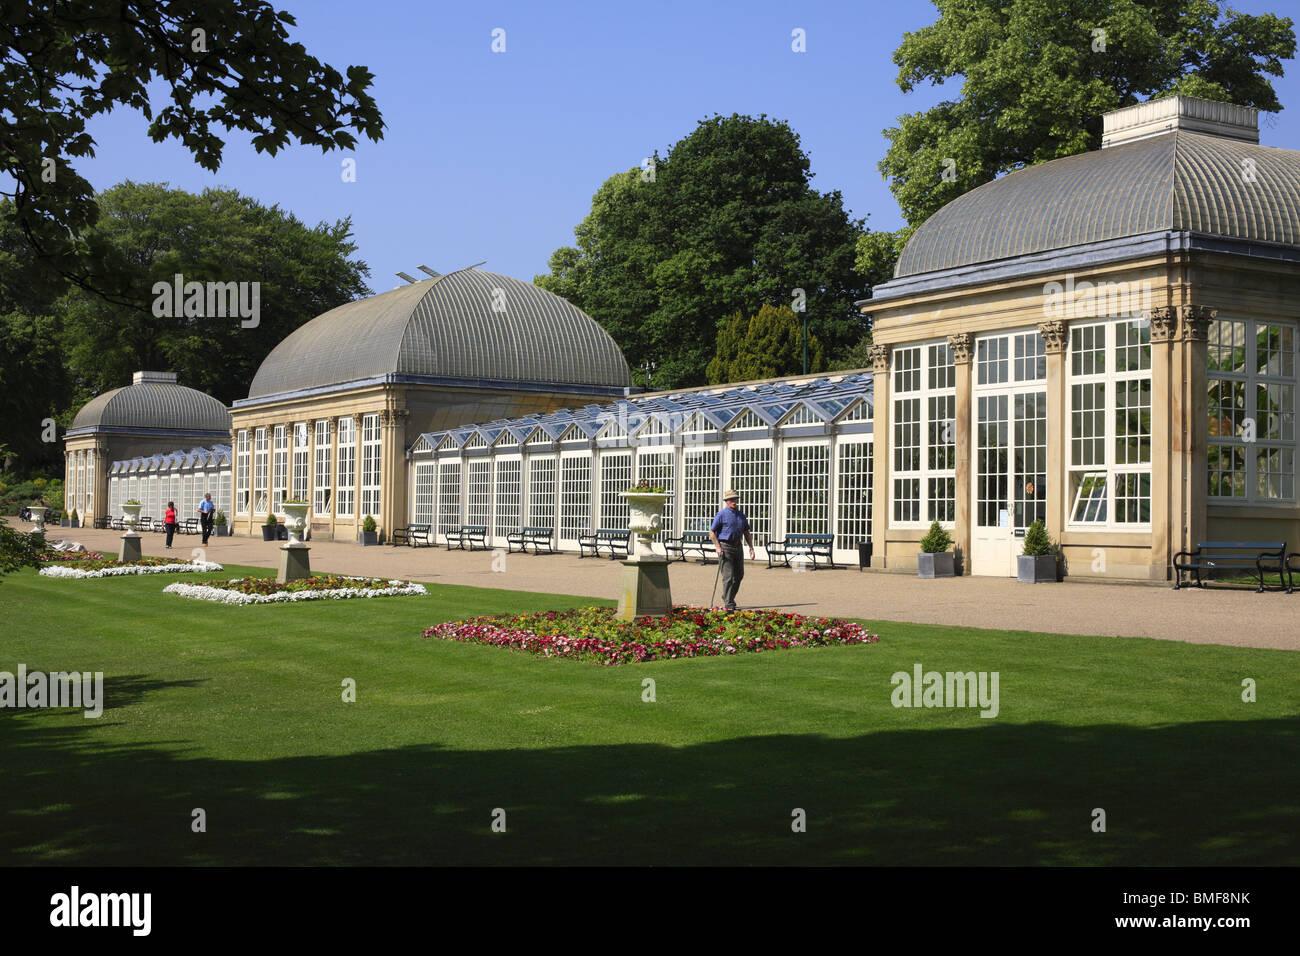 Sheffield Botanical Gardens Stock Photo